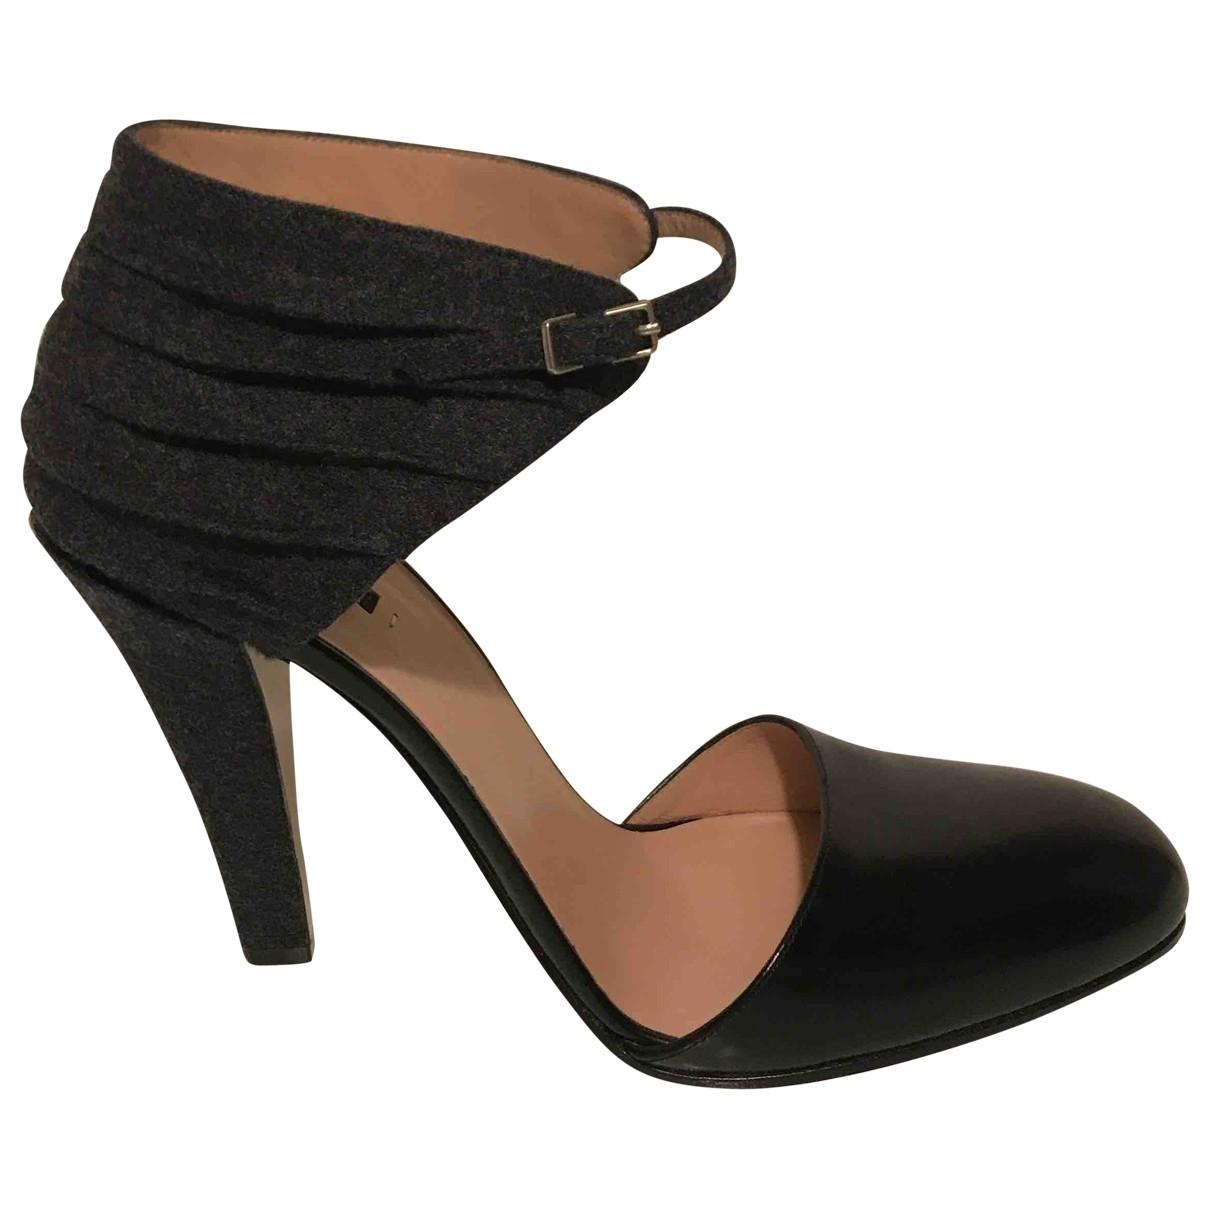 Giorgio Armani - Escarpins   pour femme en cuir - noir